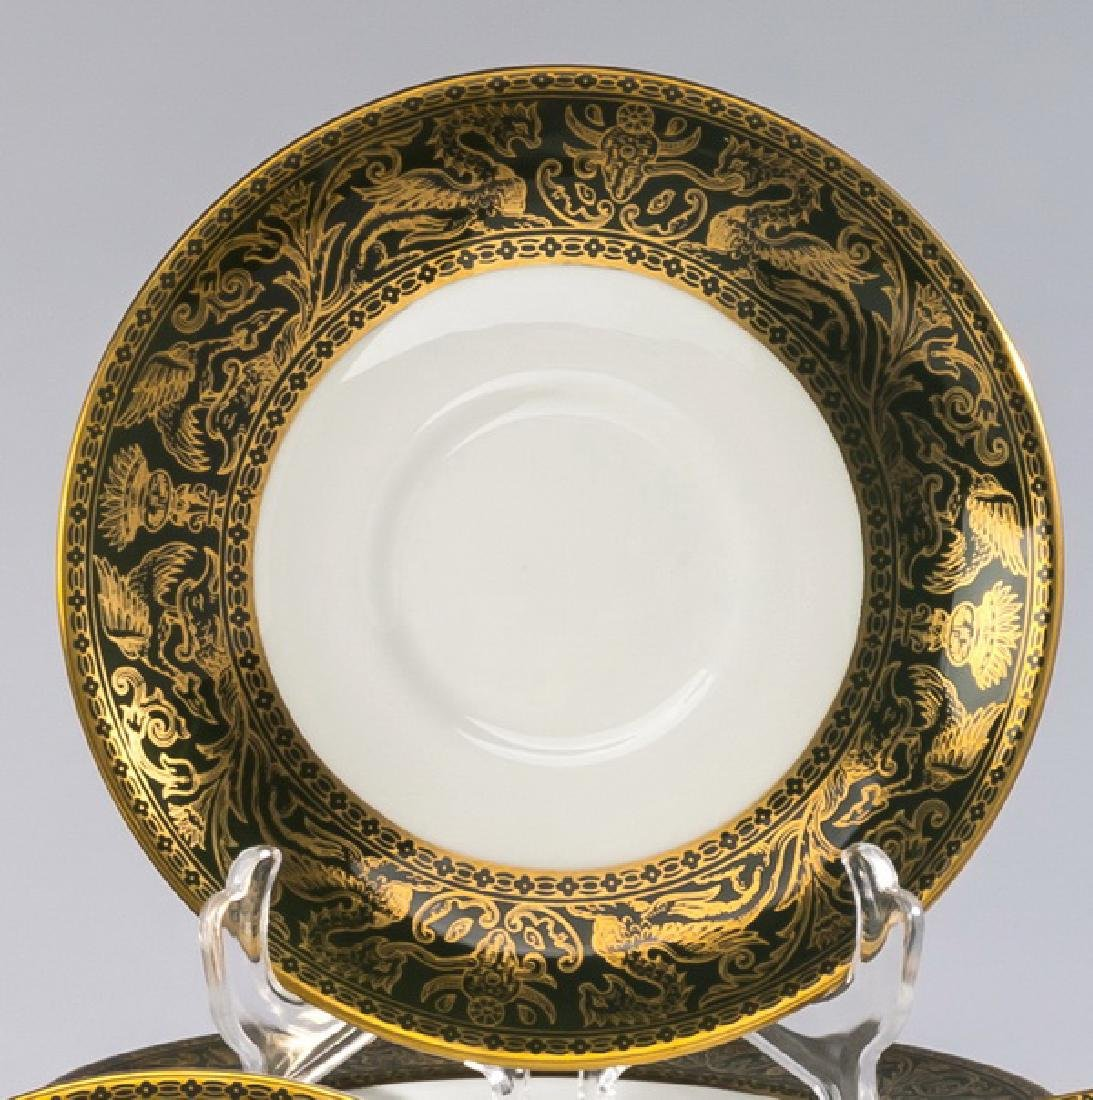 42-Piece Wedgwood 'Florentine' dinner service for 8 - 2